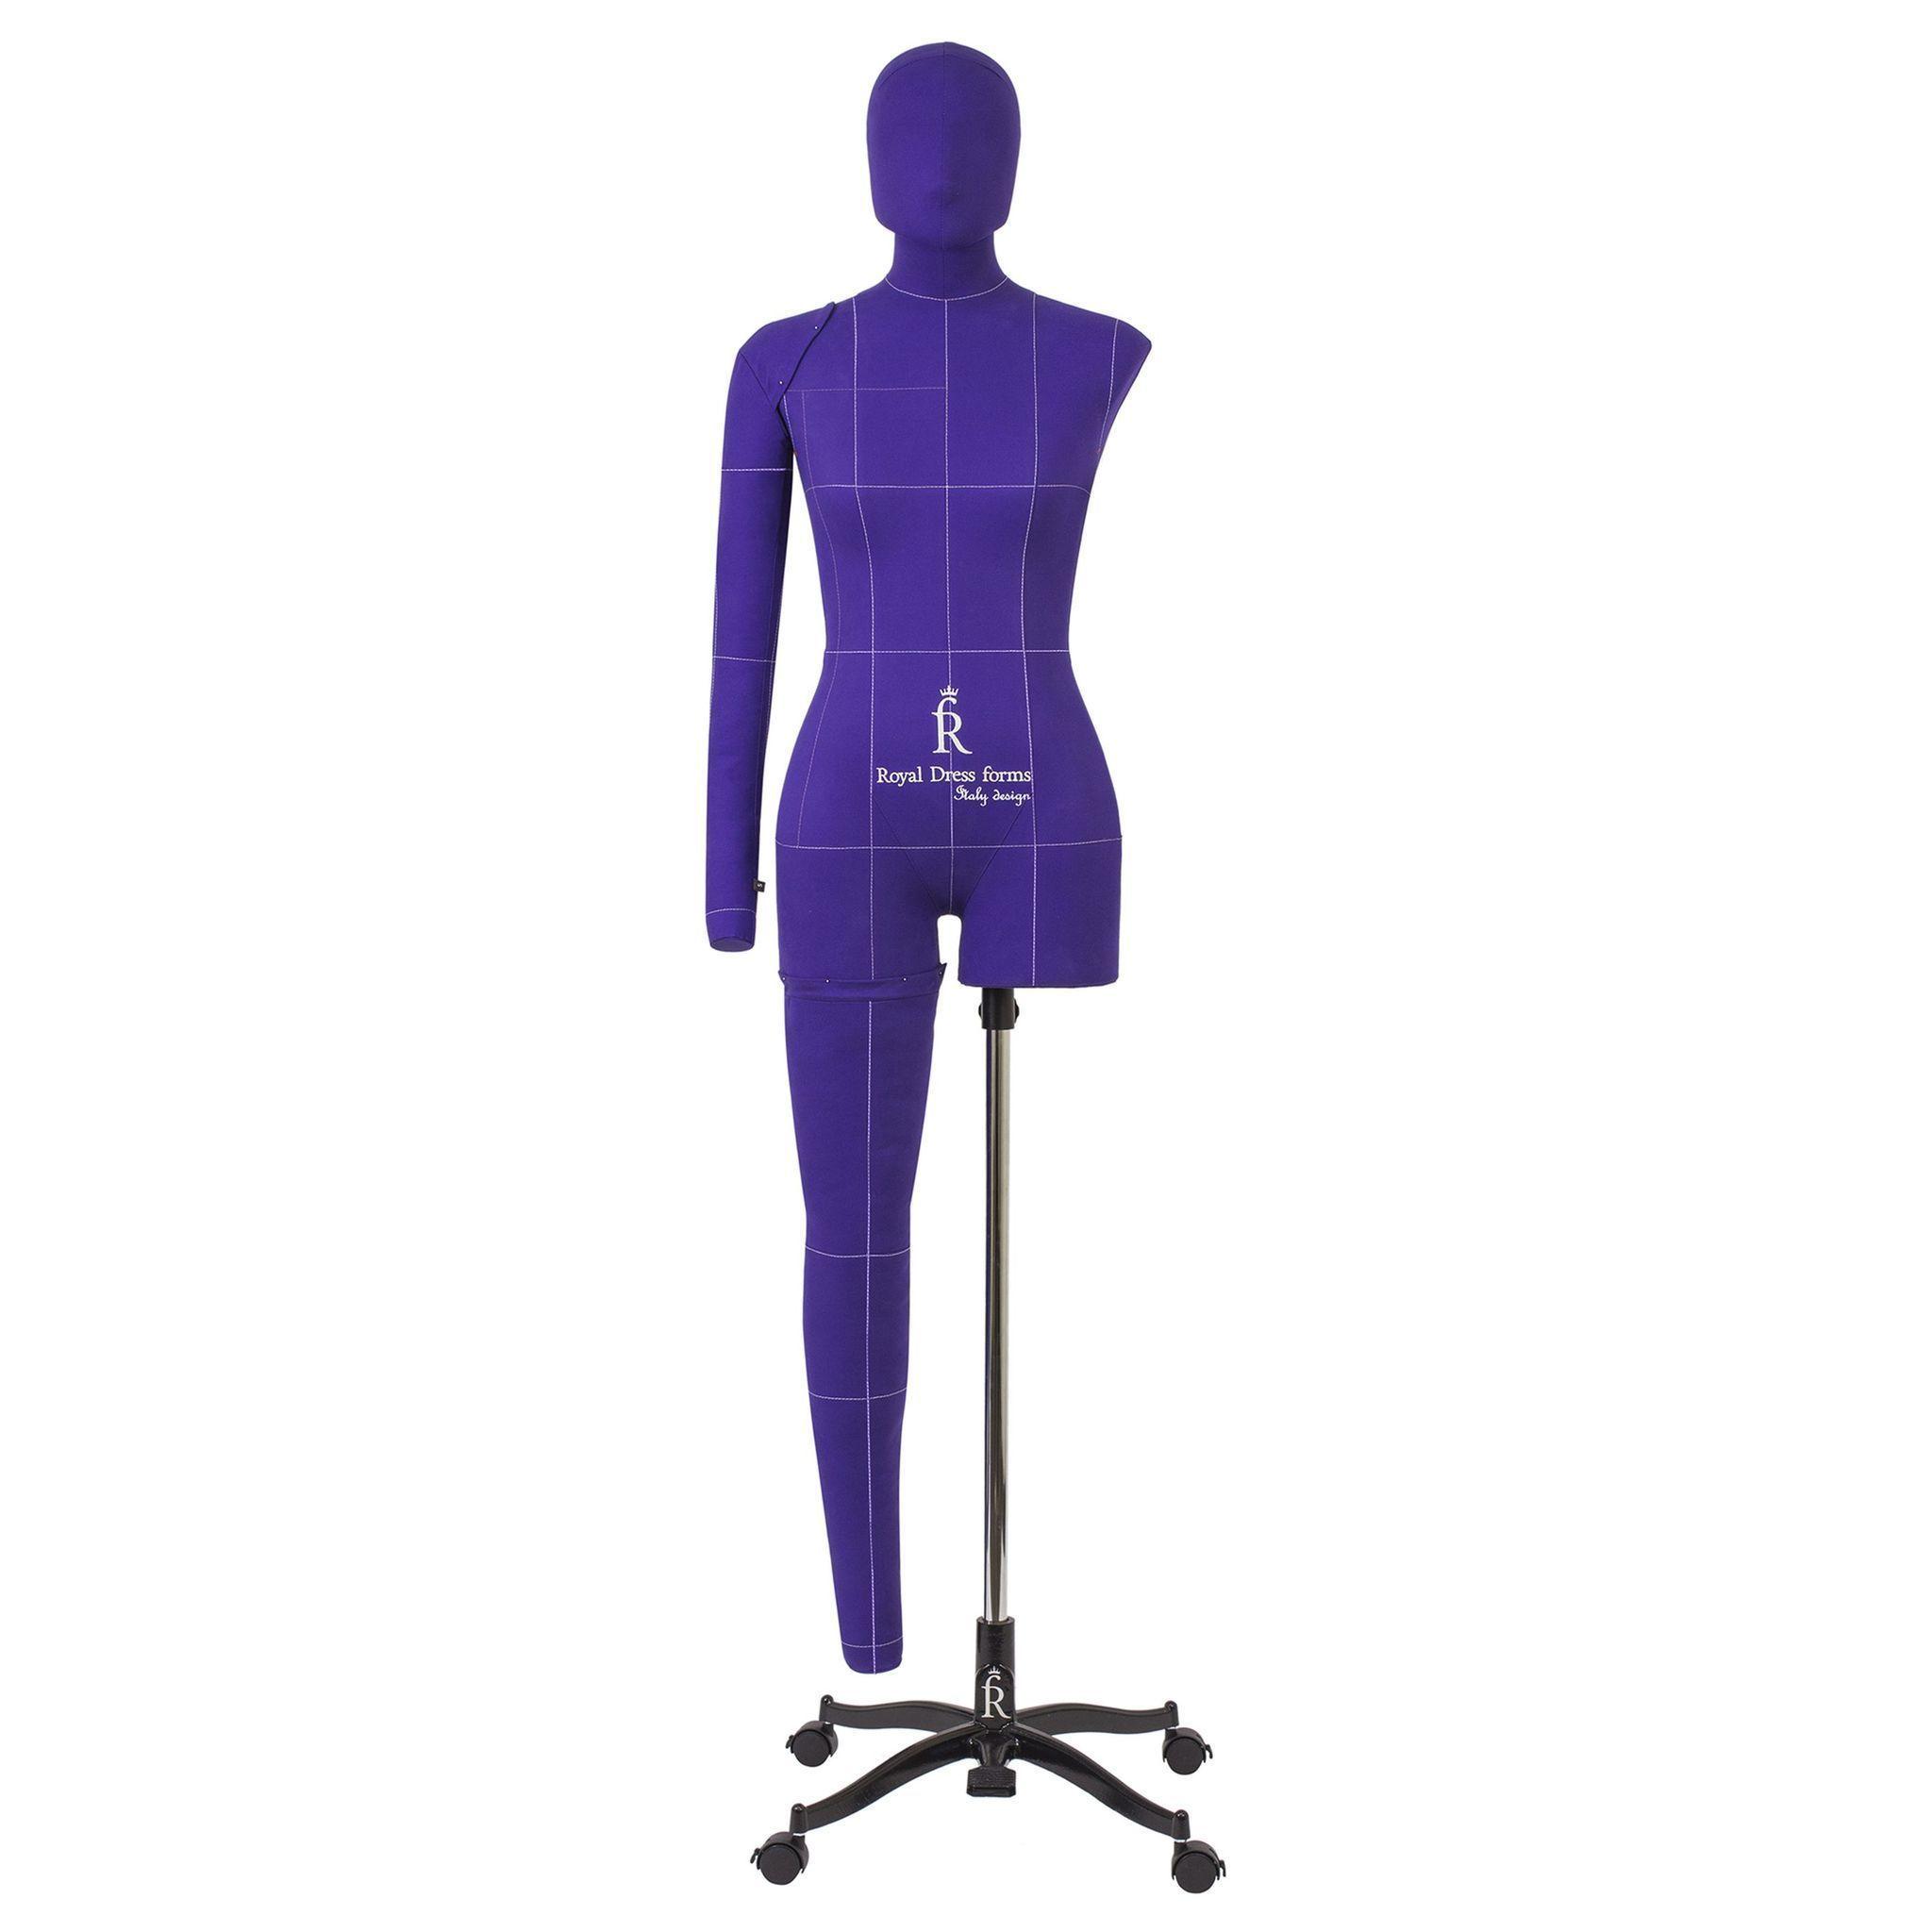 Манекен портновский Моника, комплект Арт, размер 48, ФиолетовыйФото 3